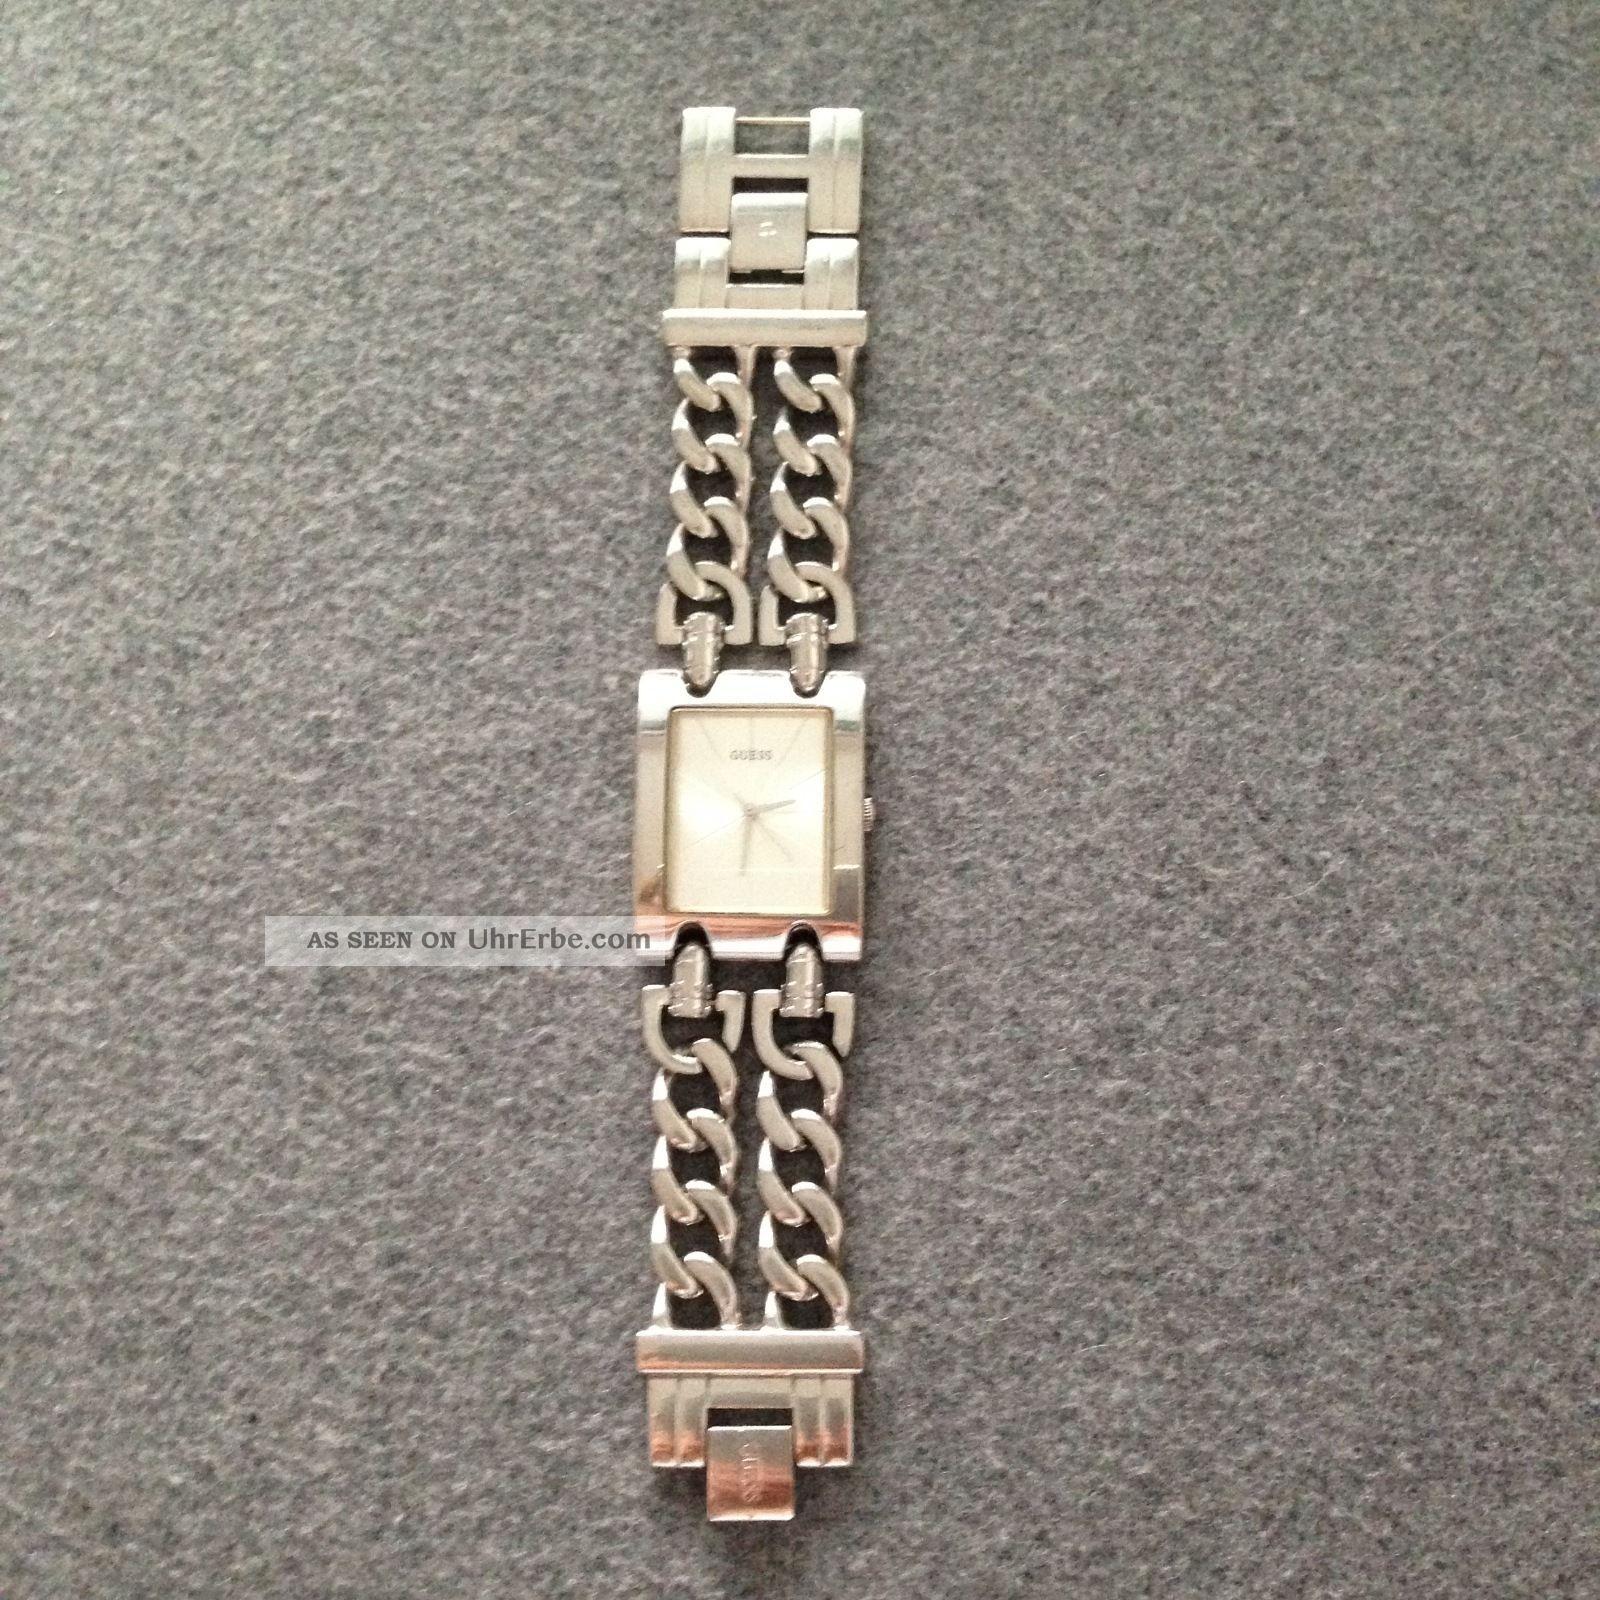 Guess Damen Uhr Aus Edelstahl Armbanduhren Bild